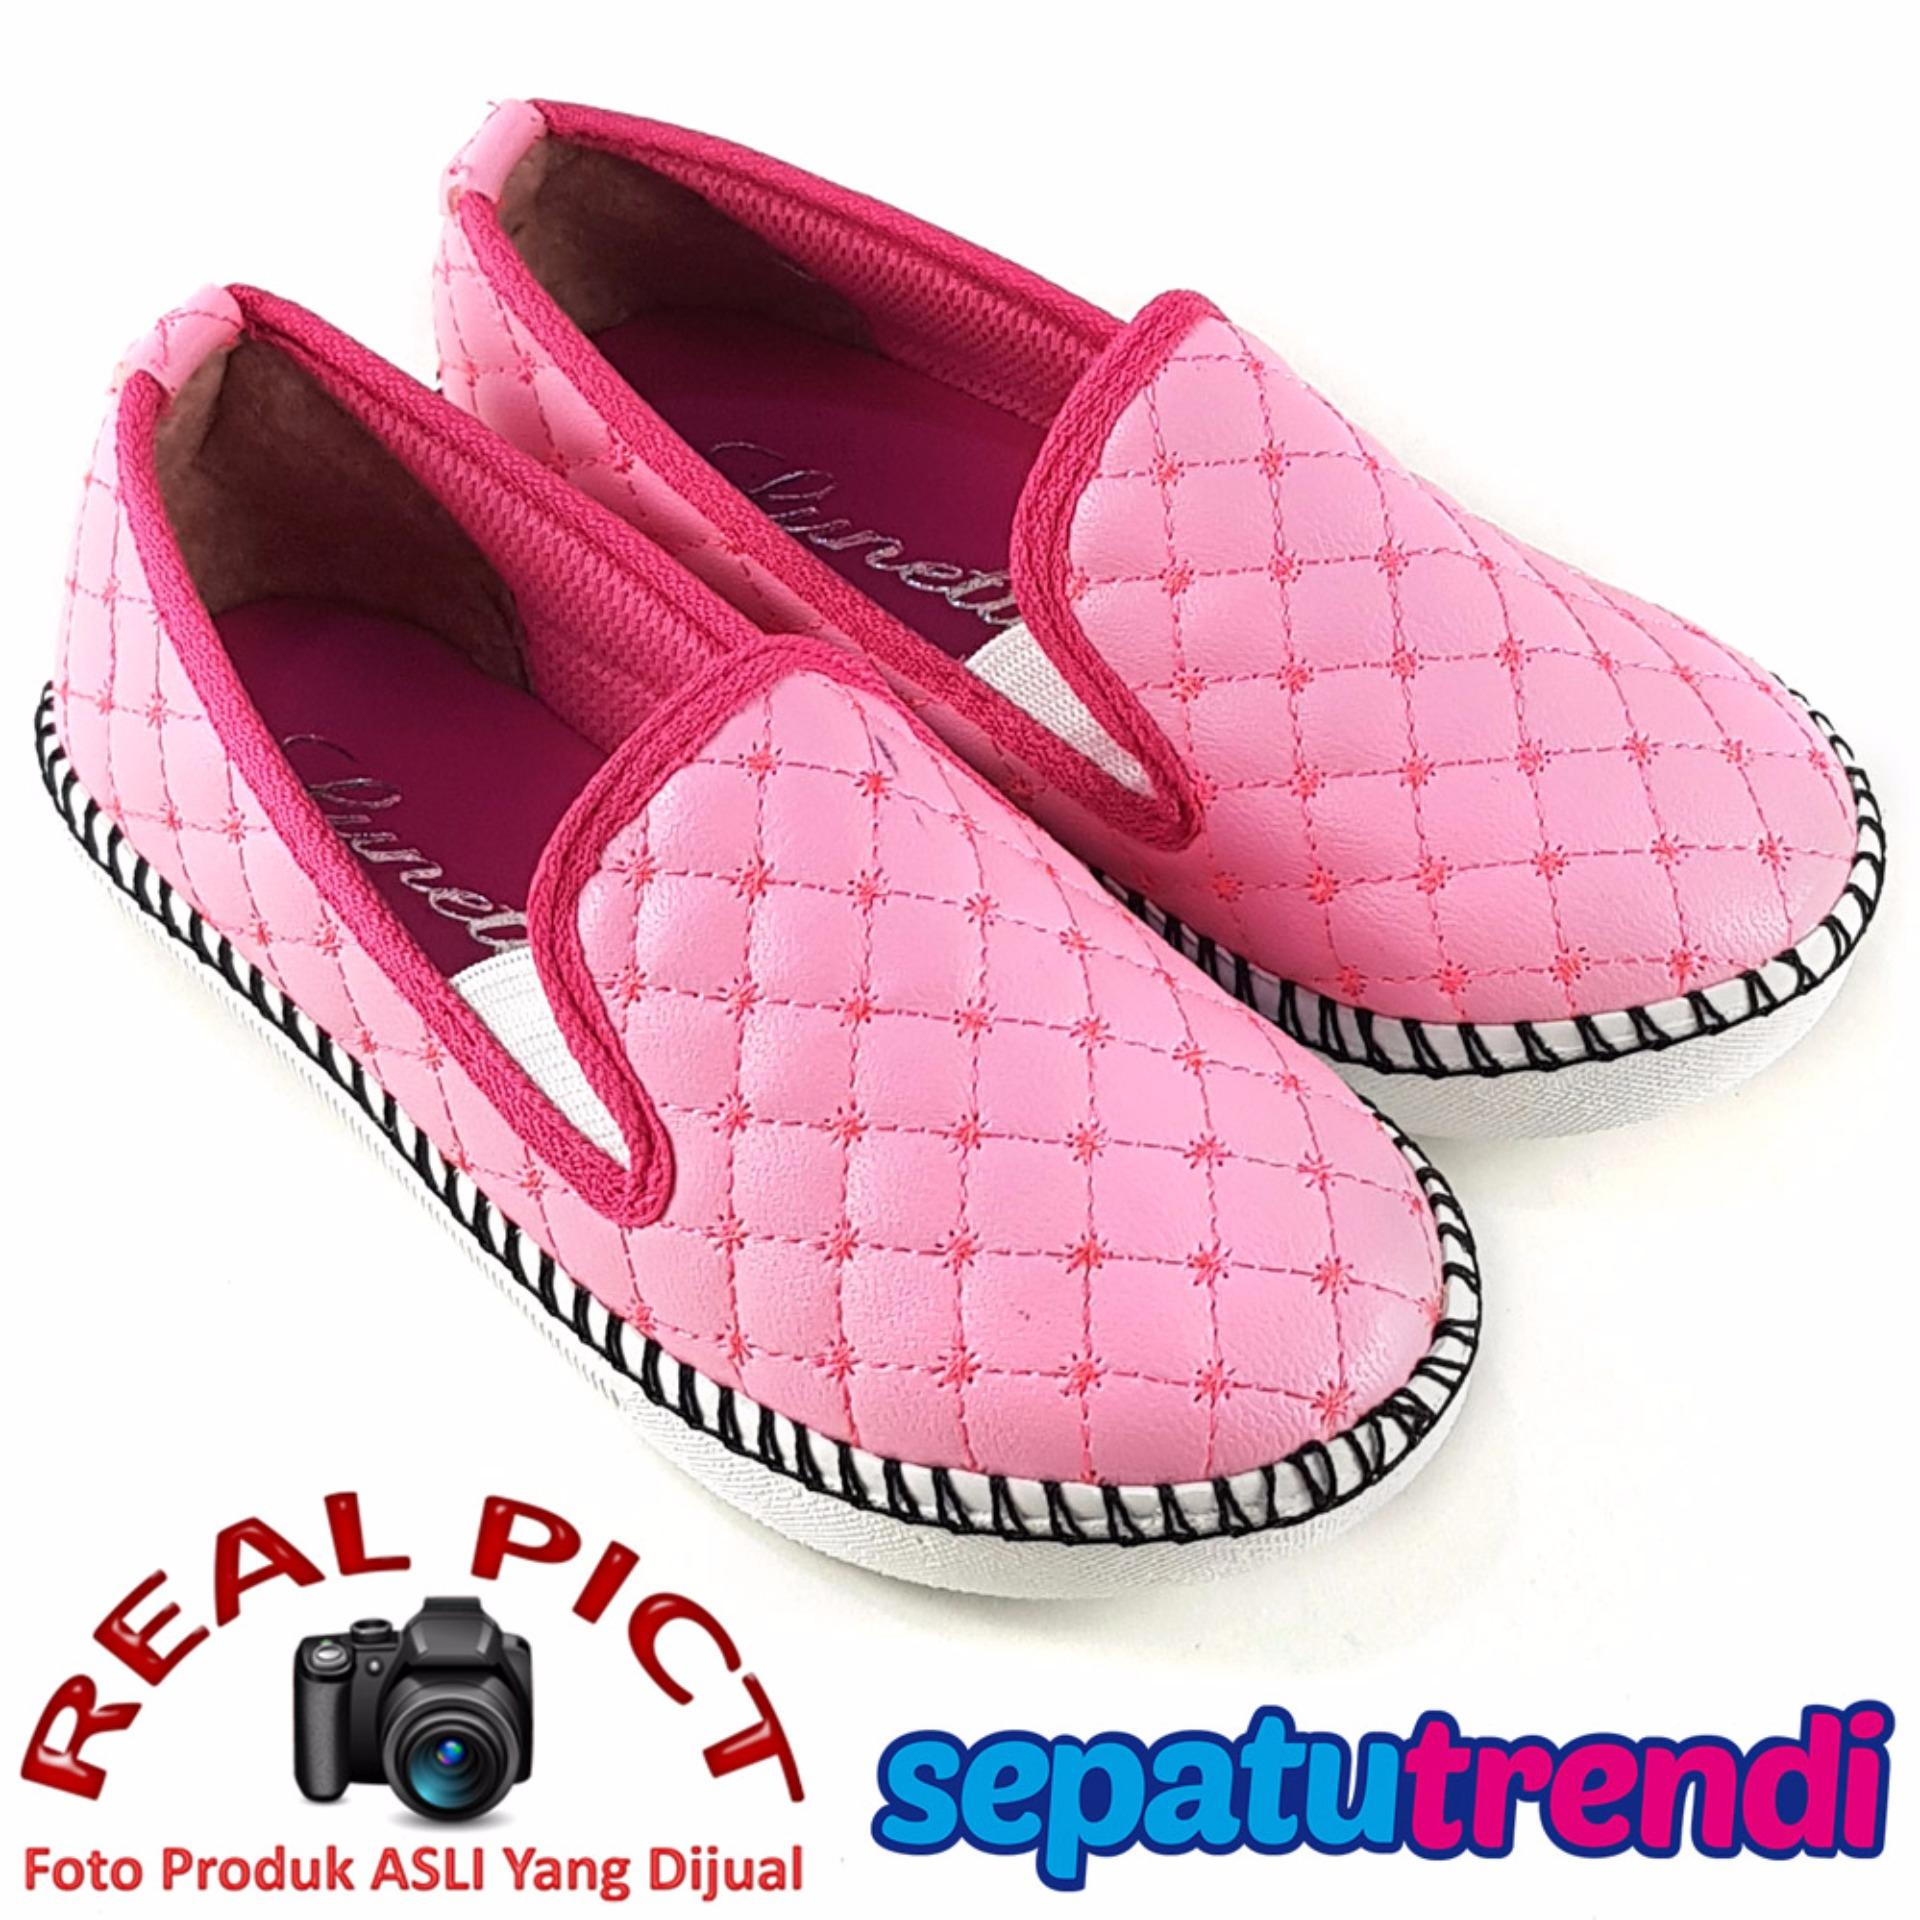 Spesifikasi Lunetta Sepatu Anak Perempuan Slip On Sol Rajut Rjag Pink Baru